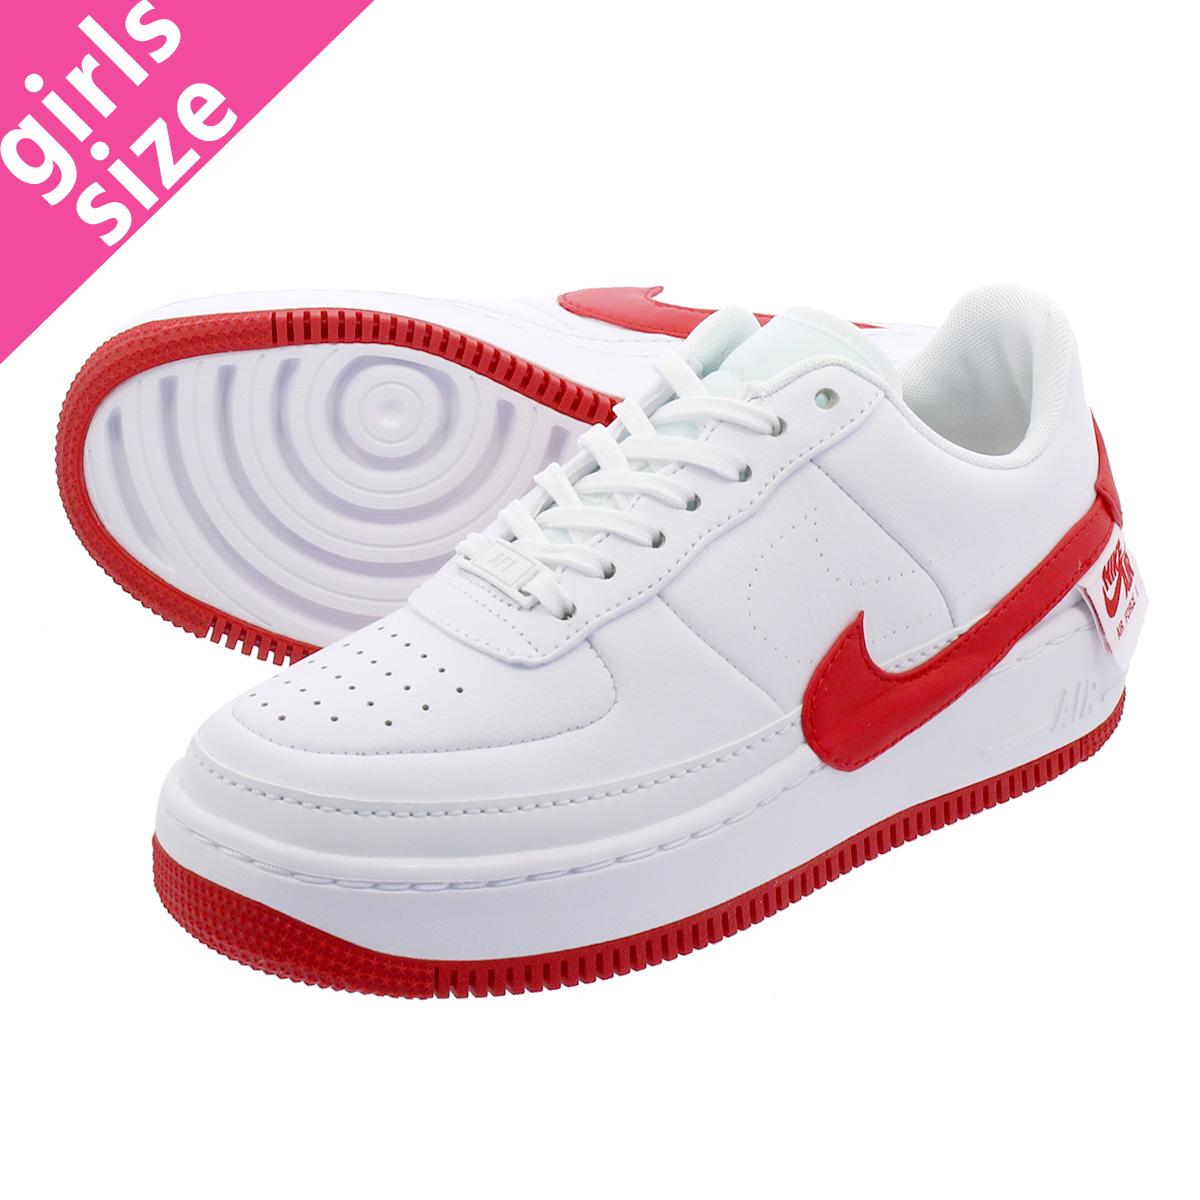 LOWTEX PLUS  NIKE WMNS AIR FORCE 1 JESTER XX Nike women air force 1 Jester  XX WHITE UNIVERSITY RED ao1220-106  810da4969